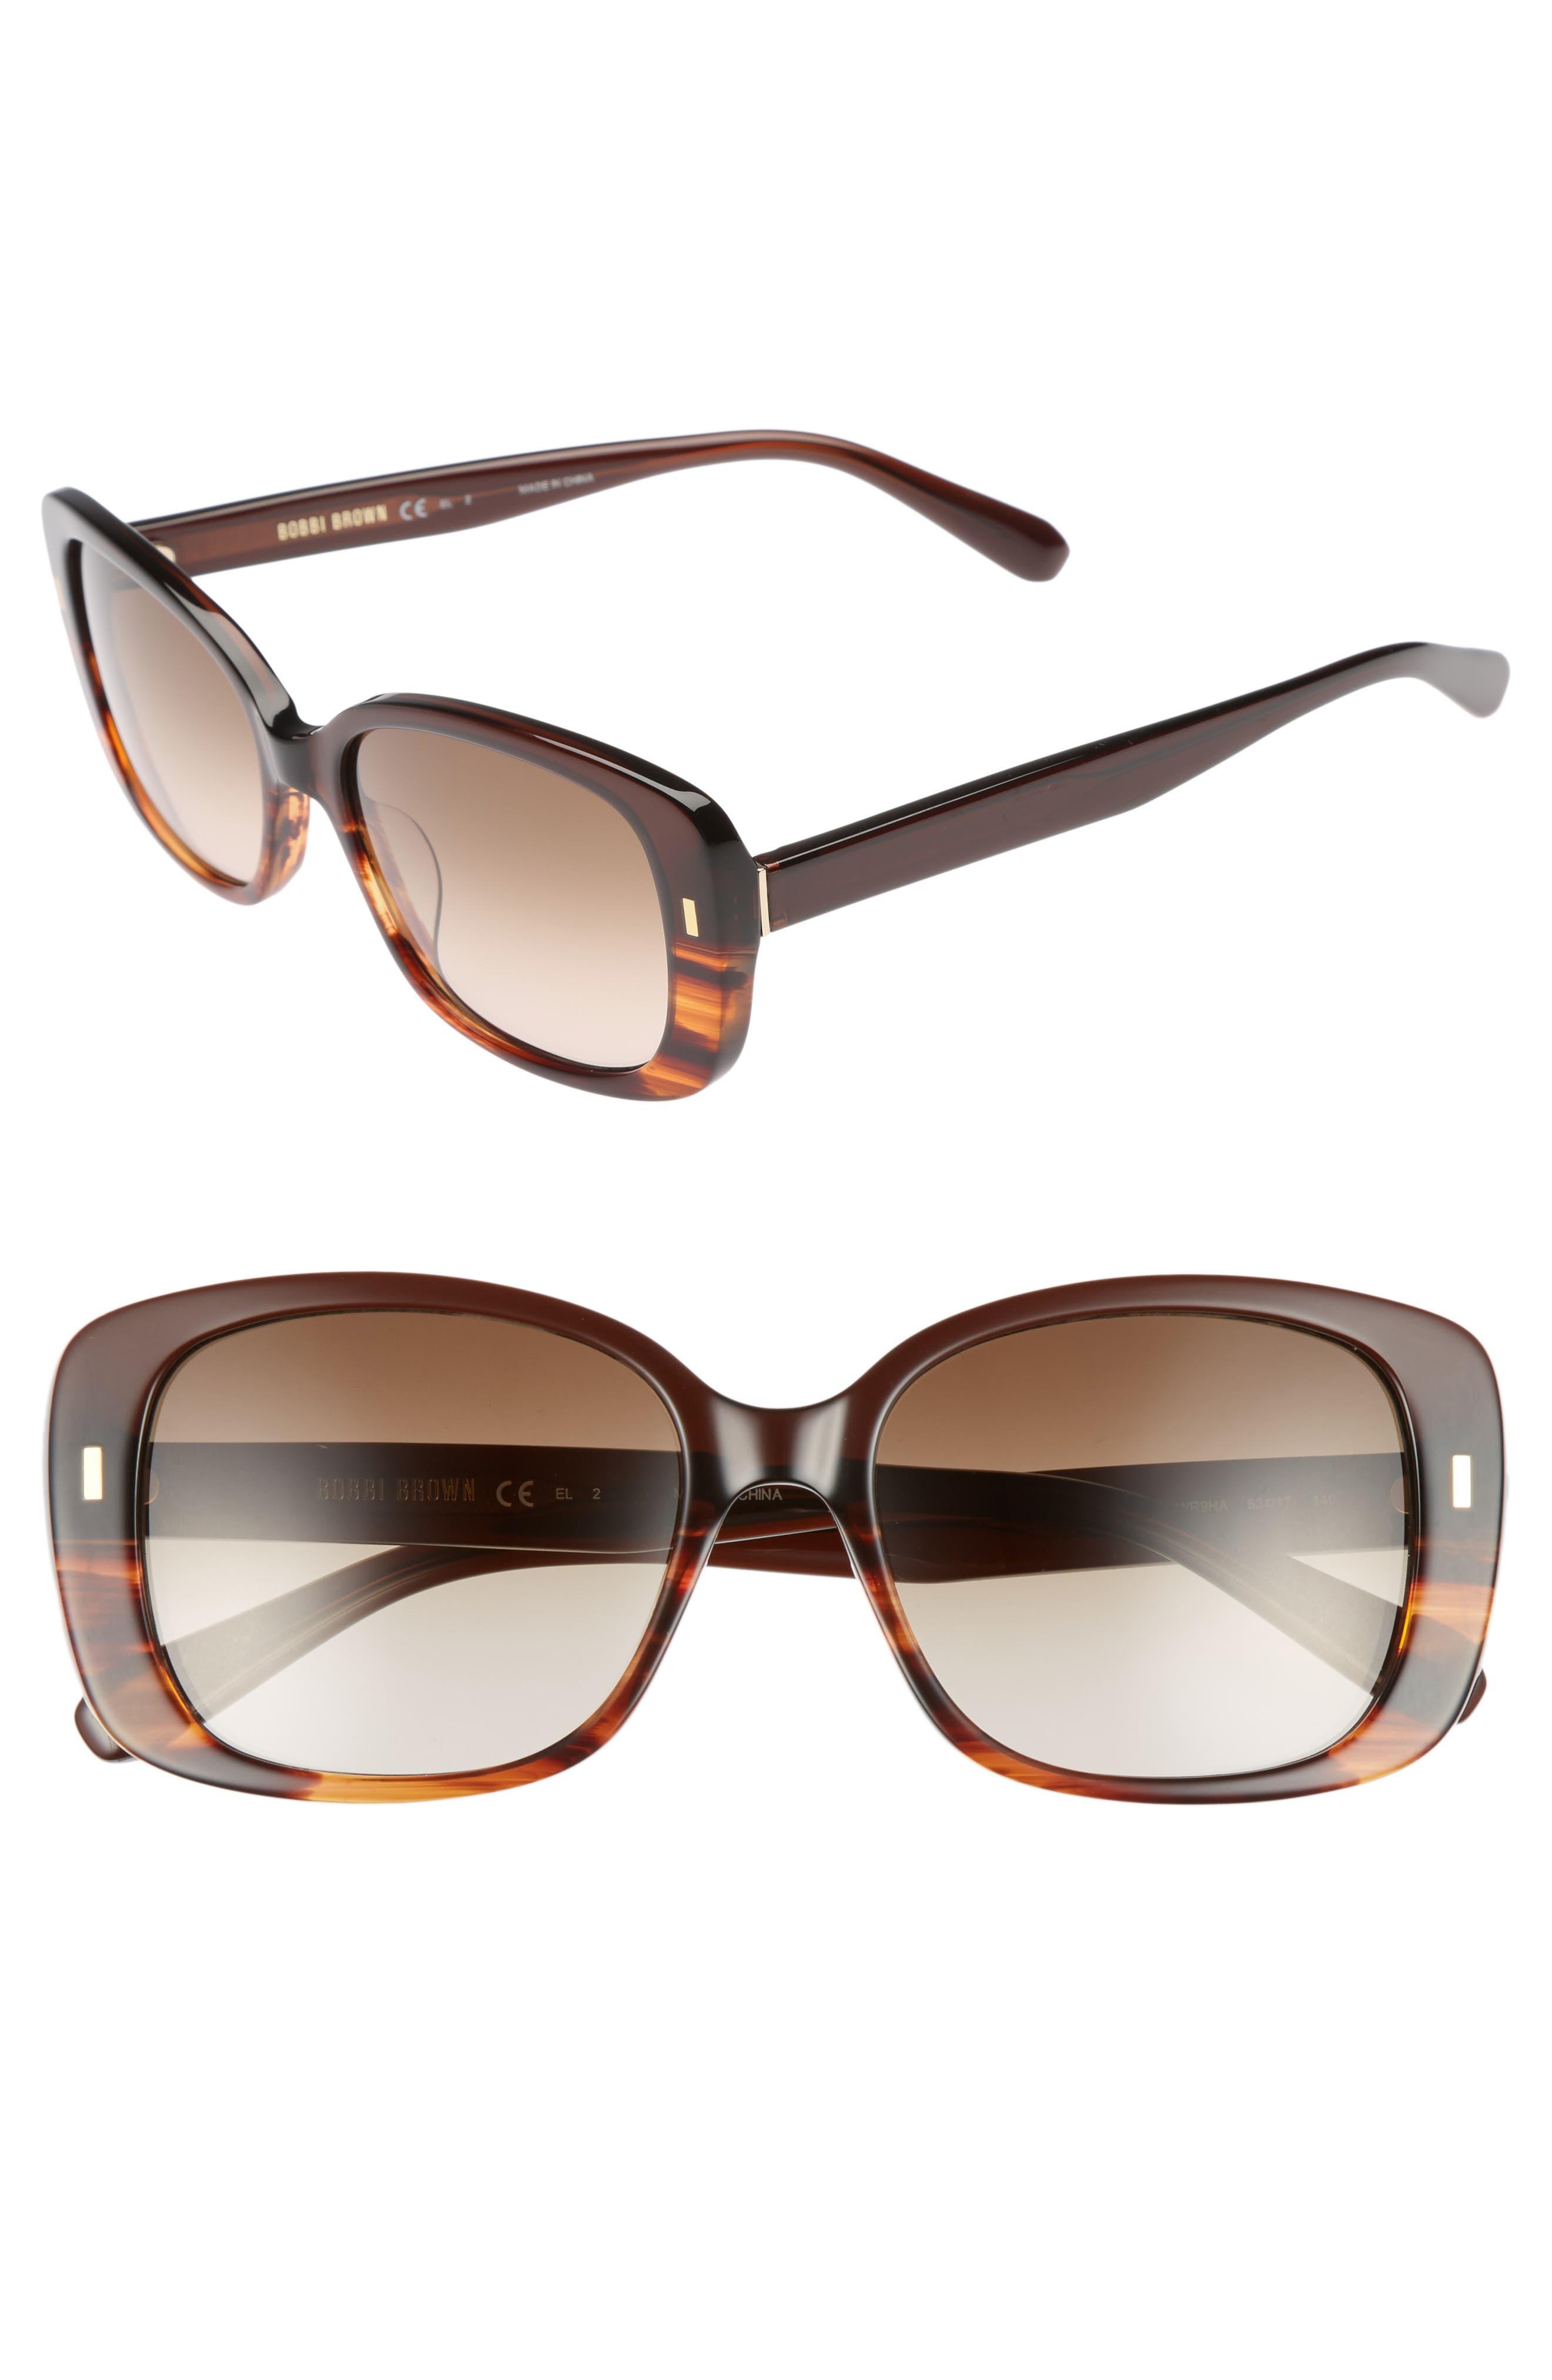 Main Image - Bobbi Brown The Audrey 53mm Square Sunglasses